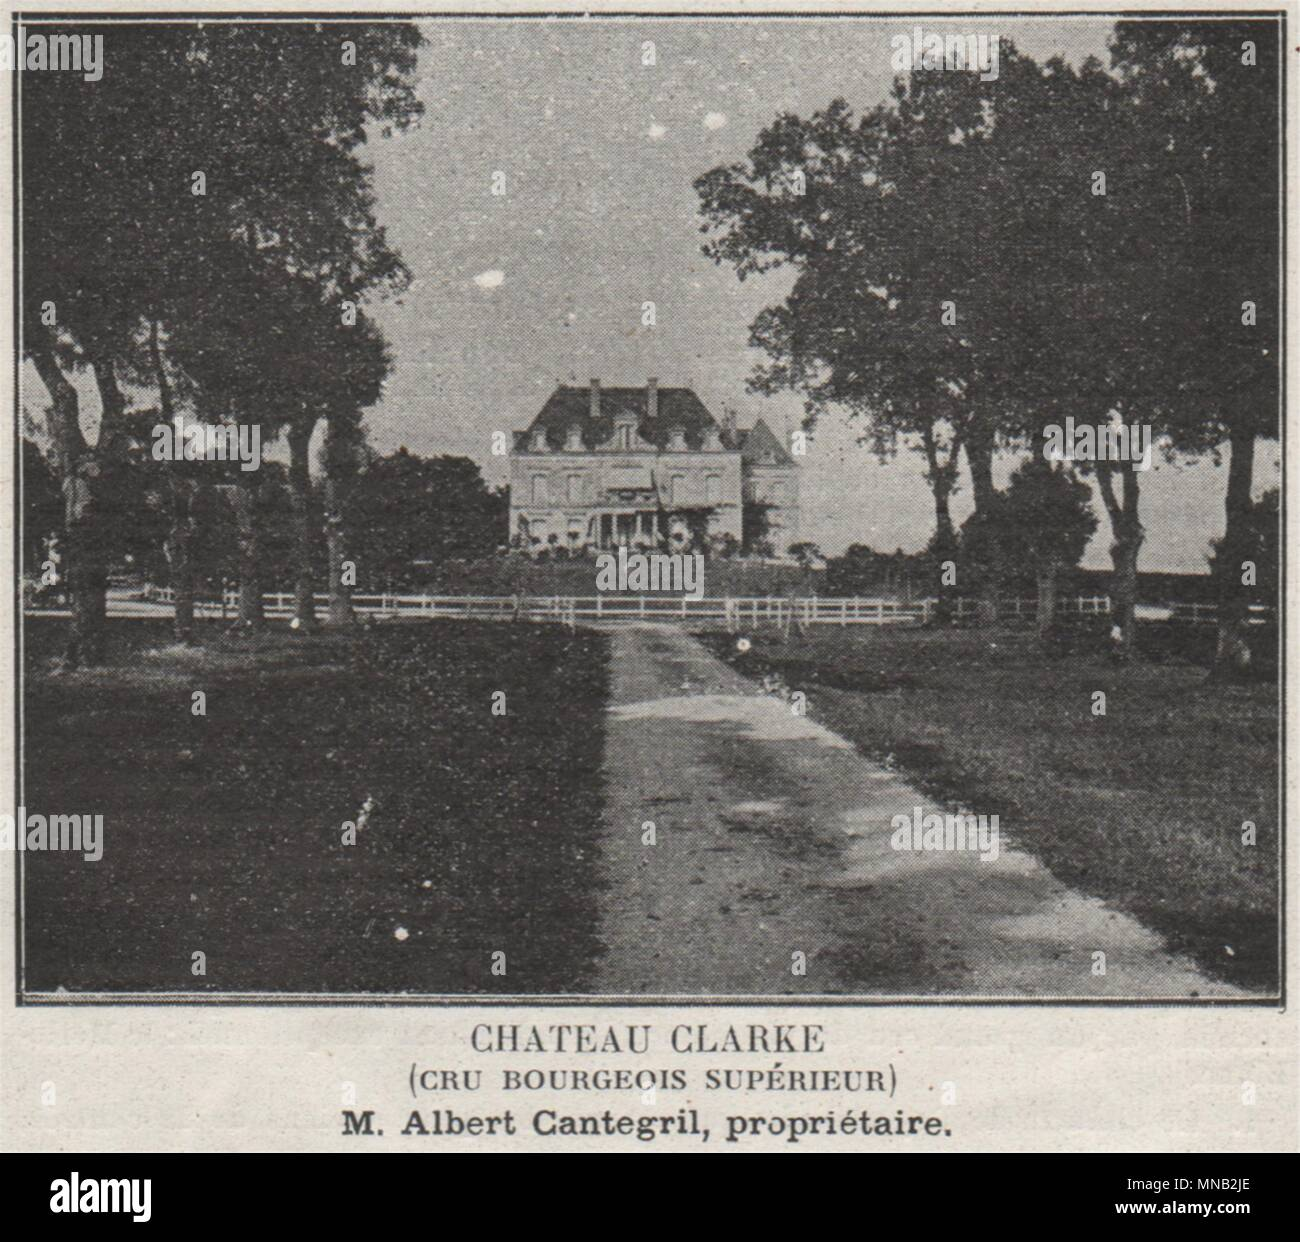 MÉDOC. LISTRAC. Chateau Clarke (Cru Bourgeois Supérieur). Cantegril. SMALL 1908 - Stock Image